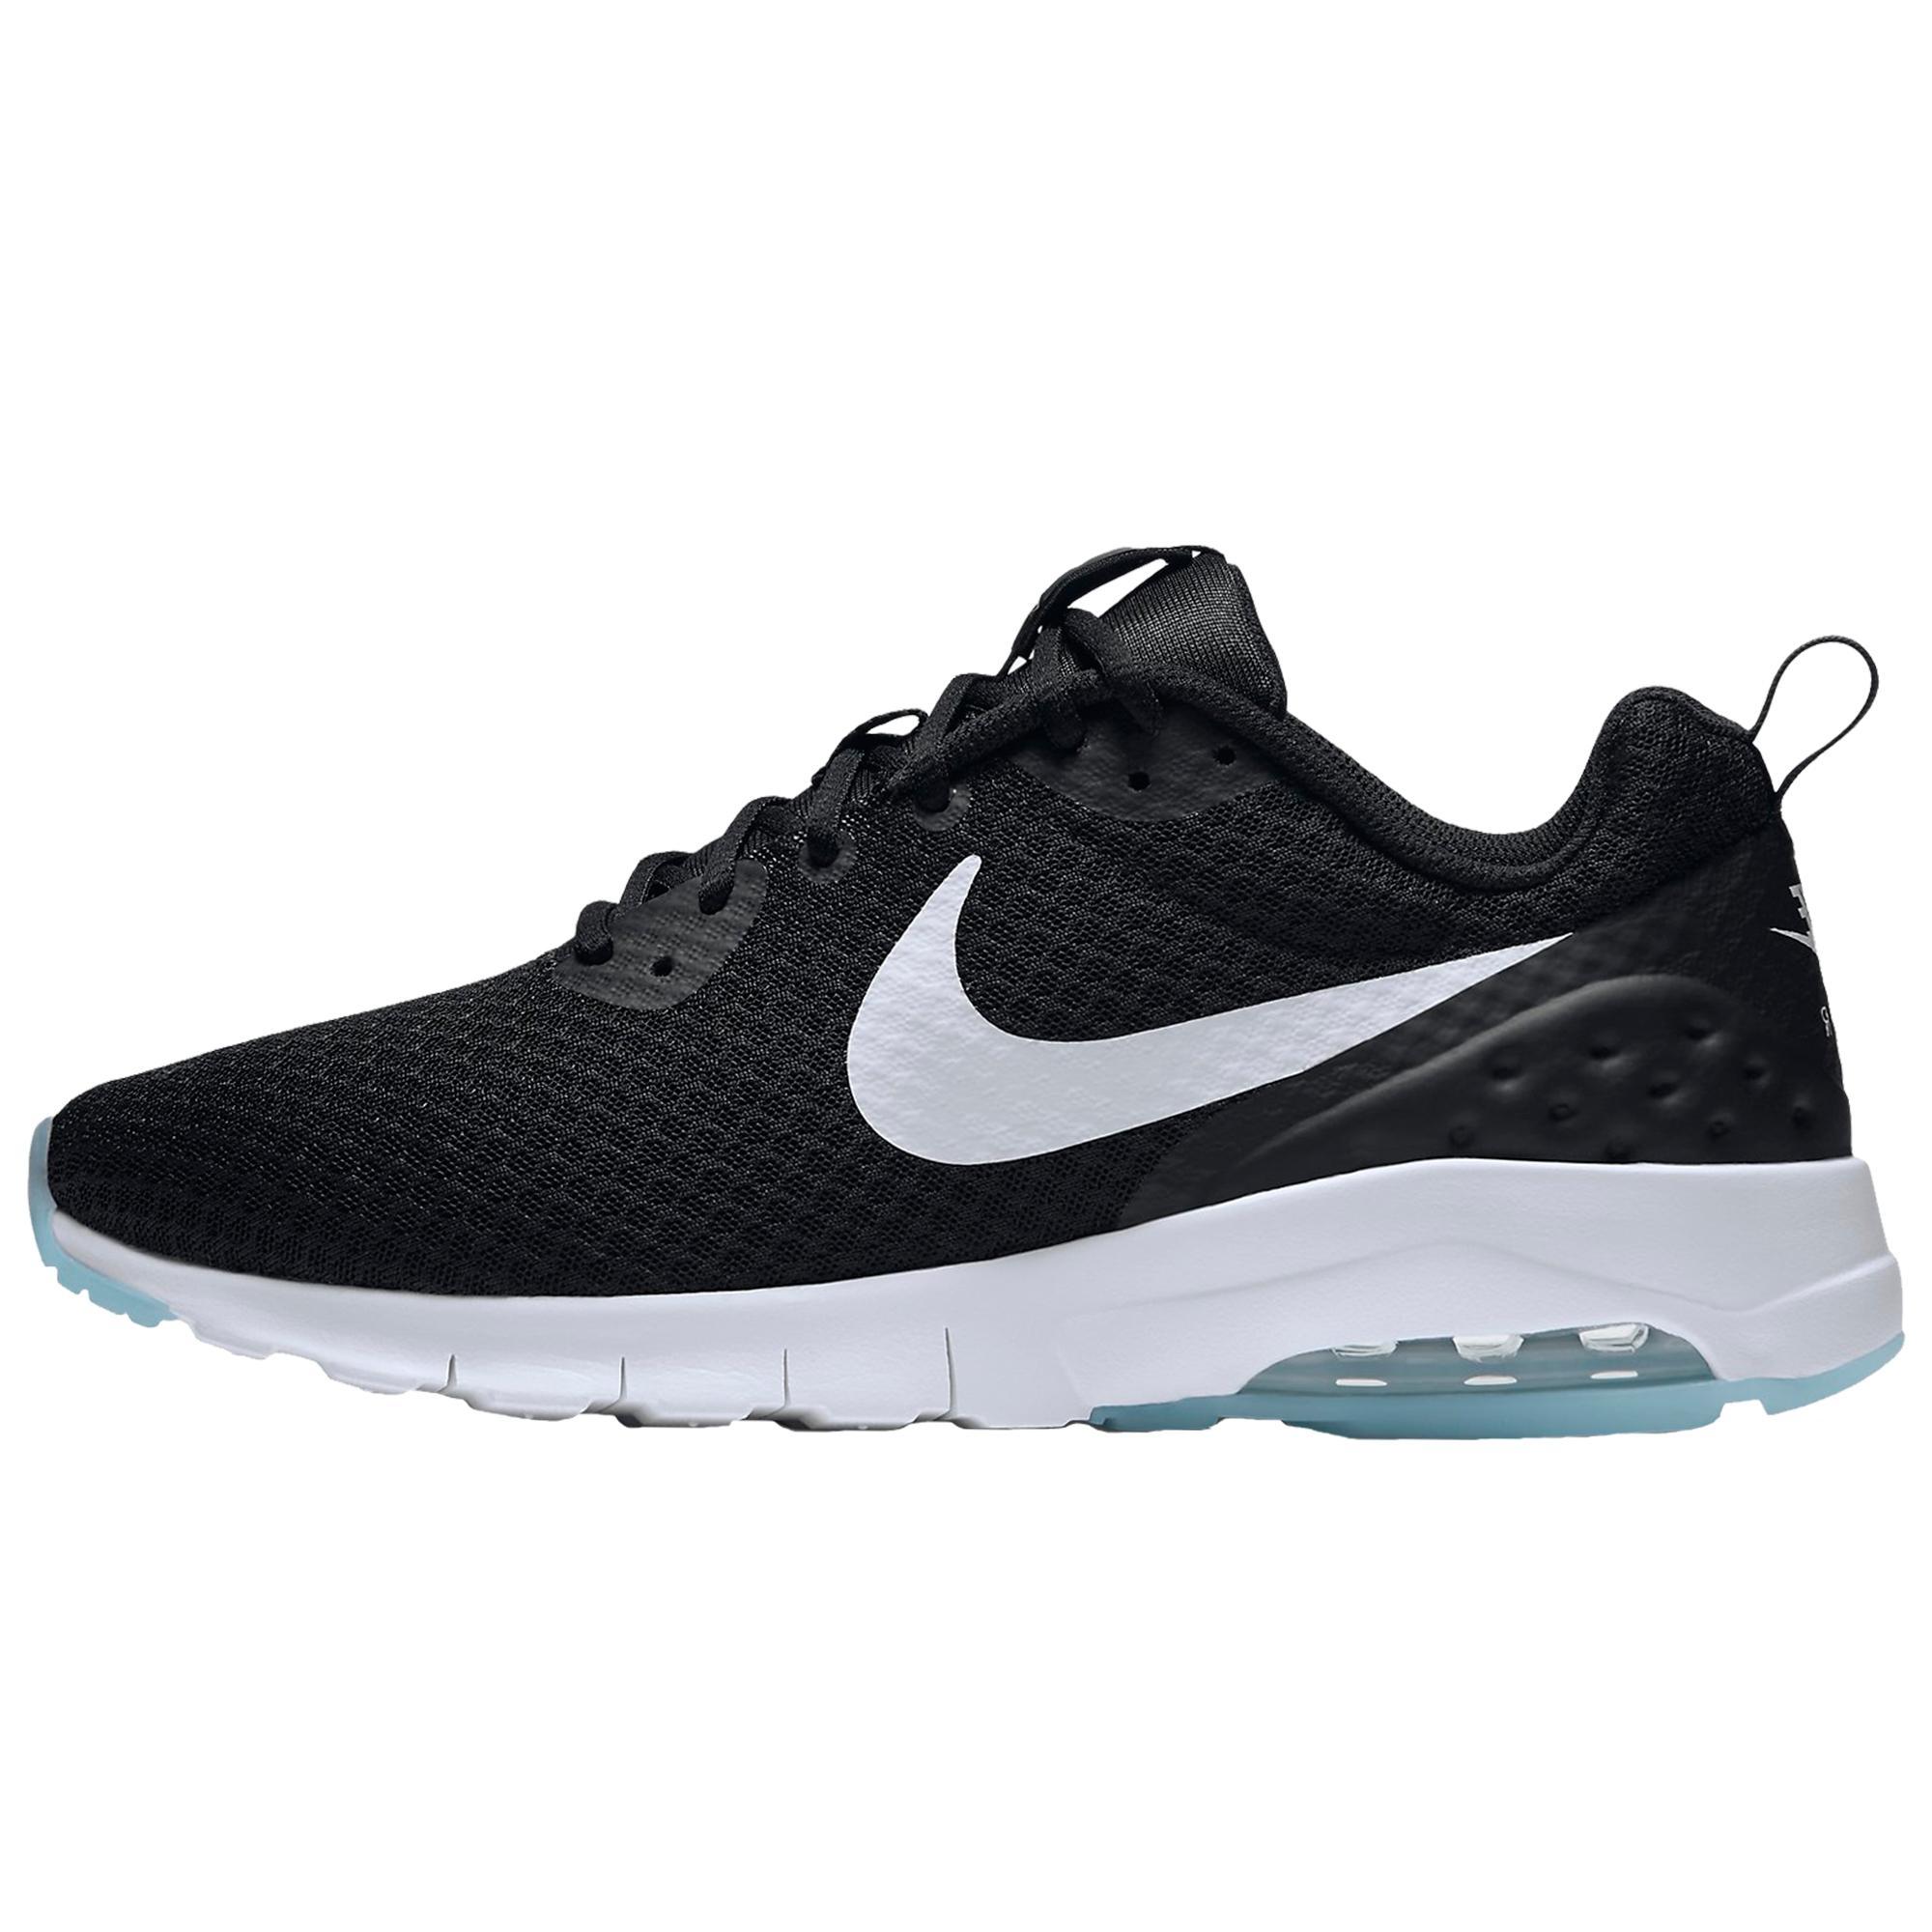 Nike Erkek Ayakkabı Air Max Motion Lw 833260-010